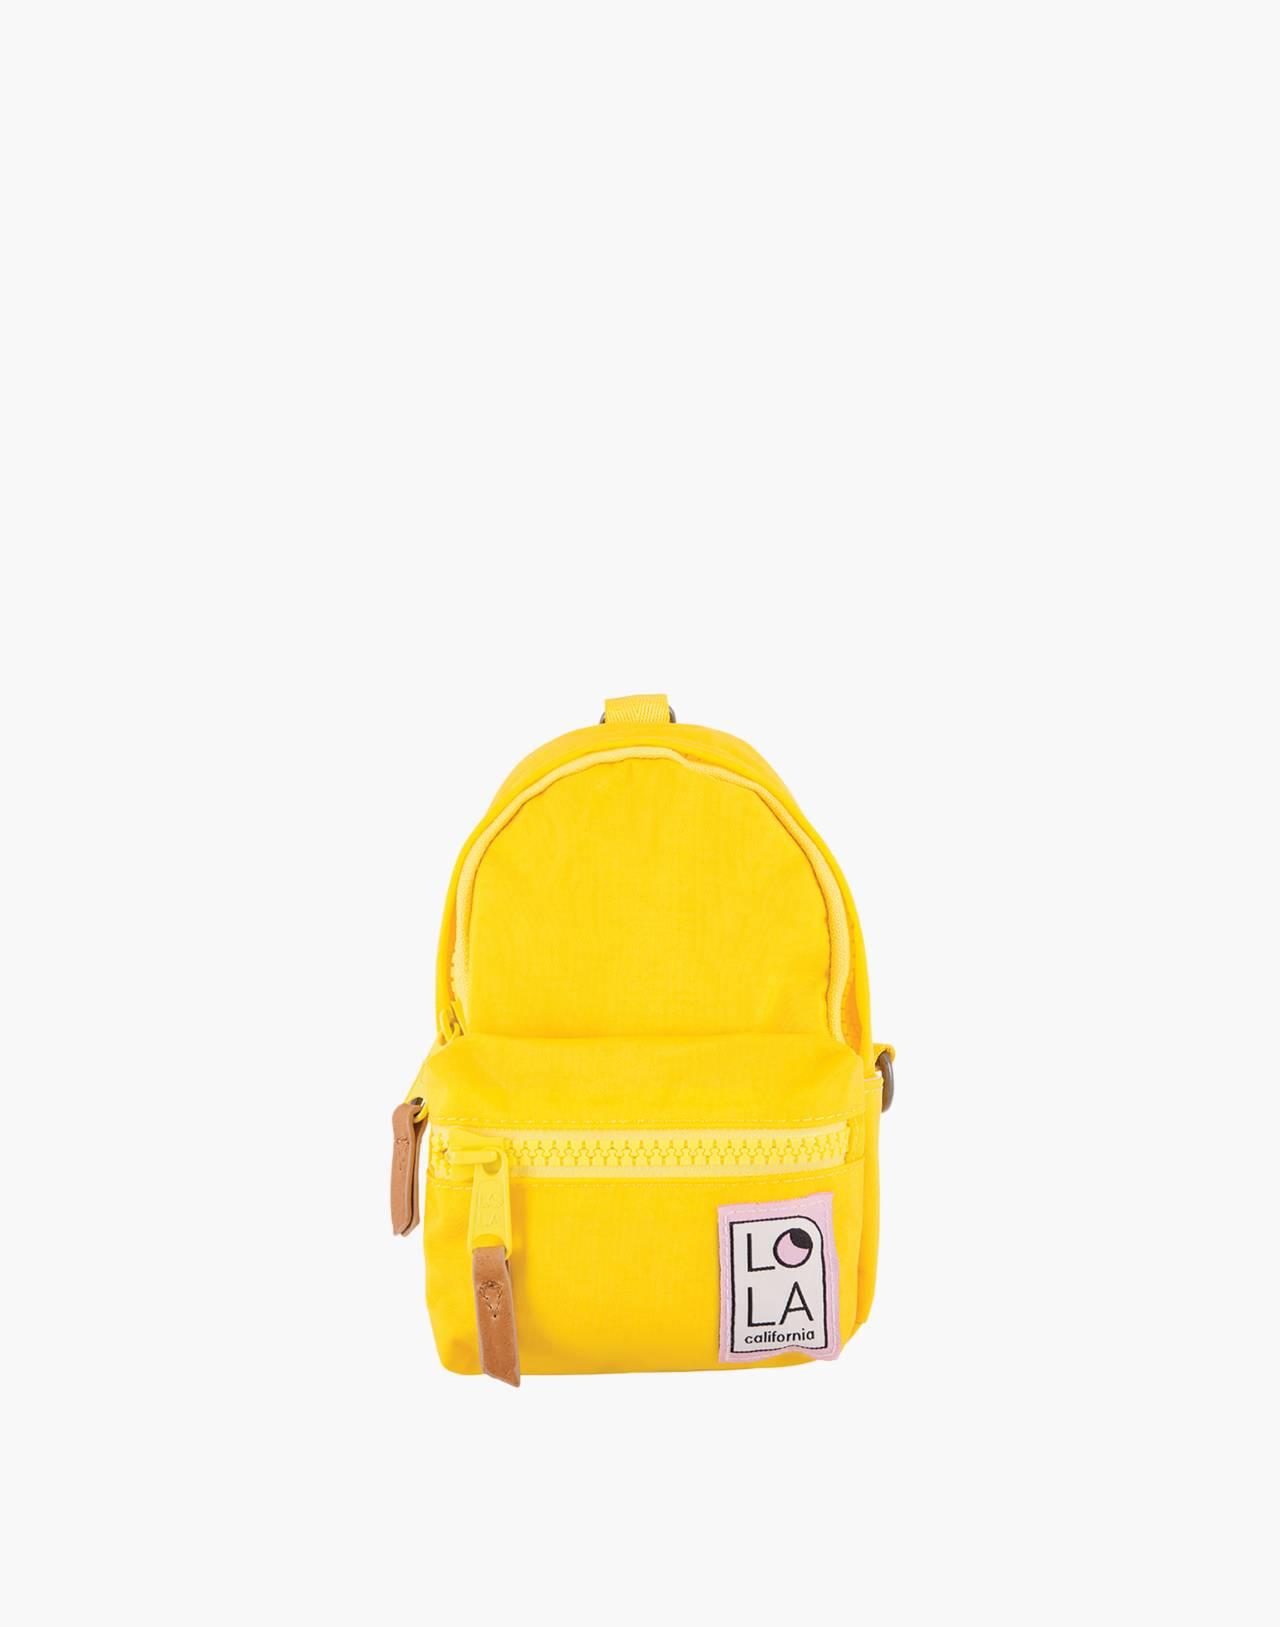 LOLA™ Mondo Stargazer Mini Convertible Backpack in yellow image 1